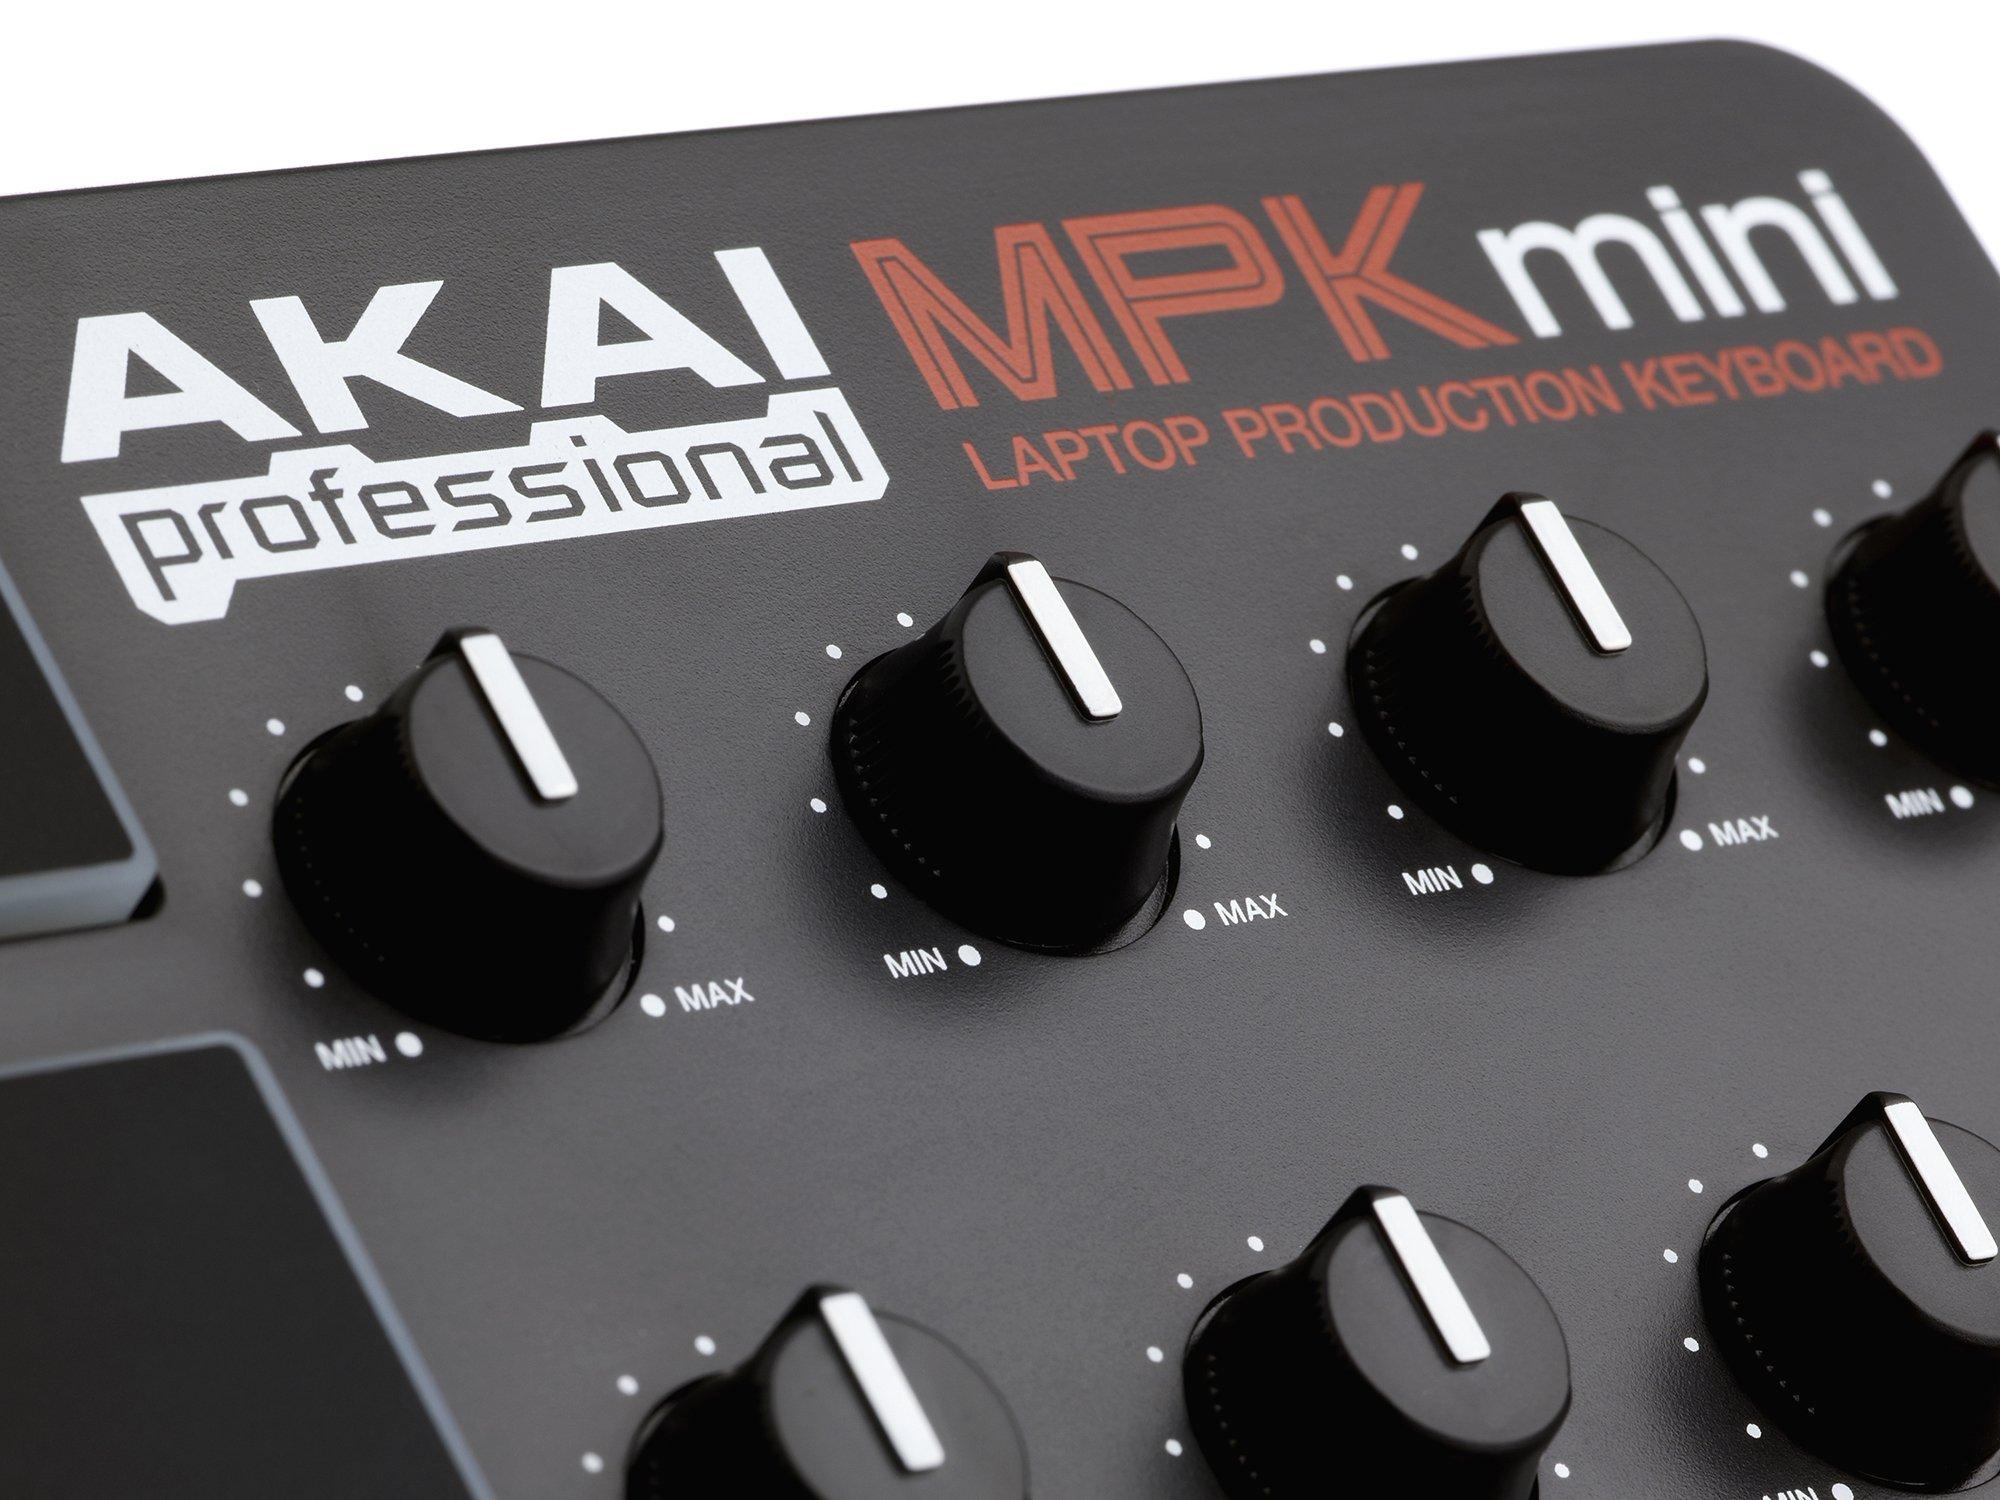 Akai Professional MPK Mini 25-Key Ultra-Portable USB MIDI Keyboard Controller (OLD MODEL) by Akai Professional